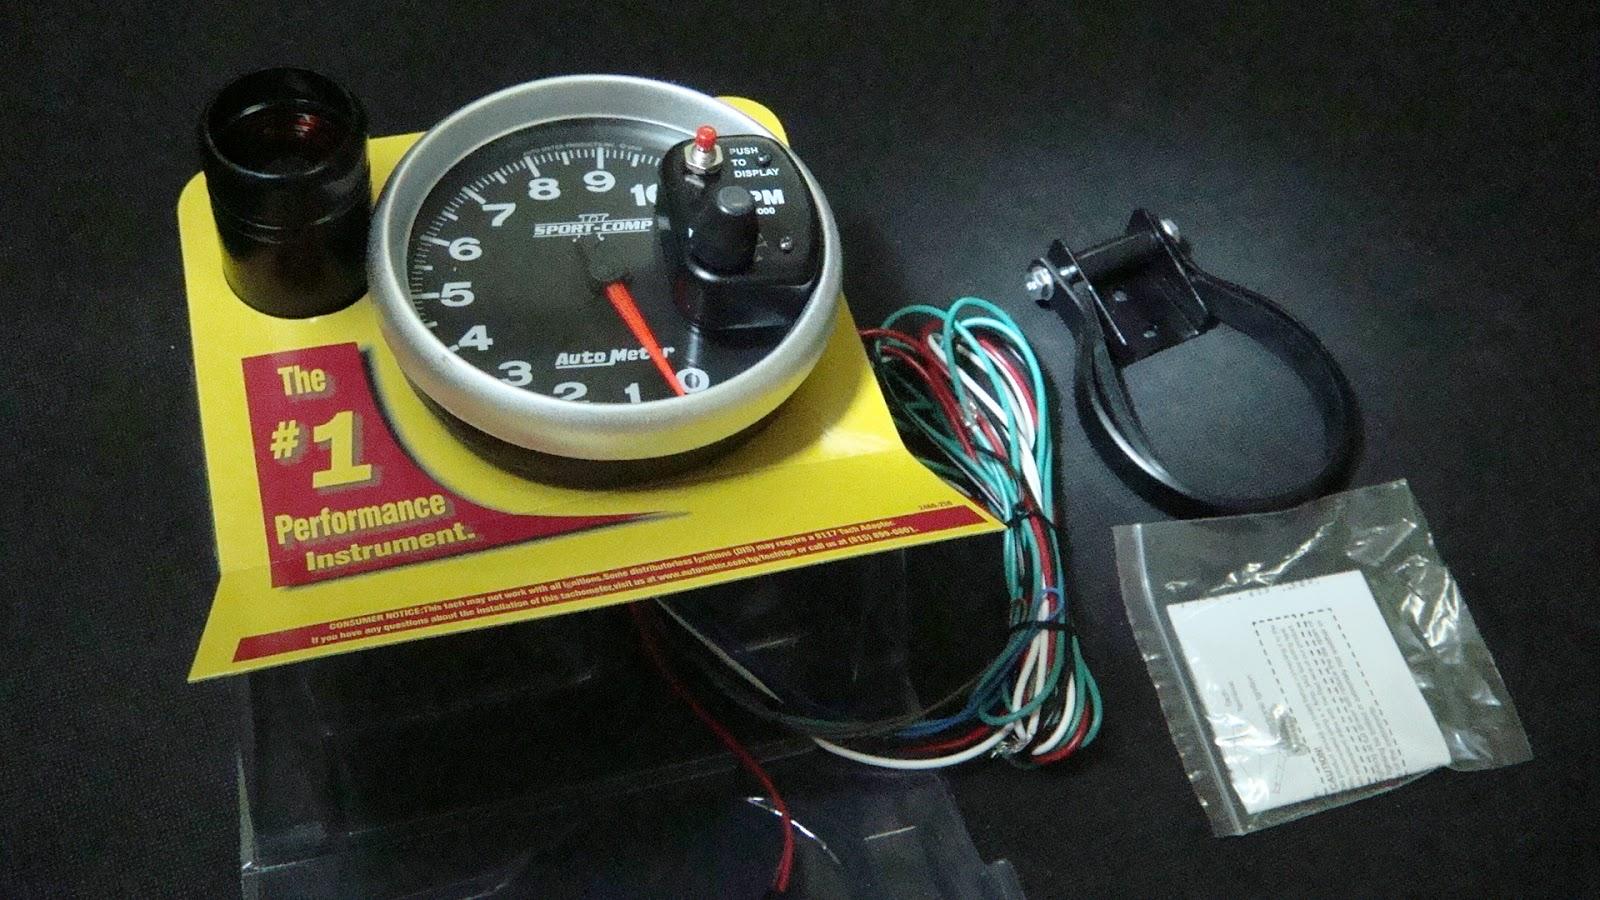 Autometer Sport Comp Tach Wiring Diagram 2003 Gas Club Car Myitems 5 39 Monster Rpm